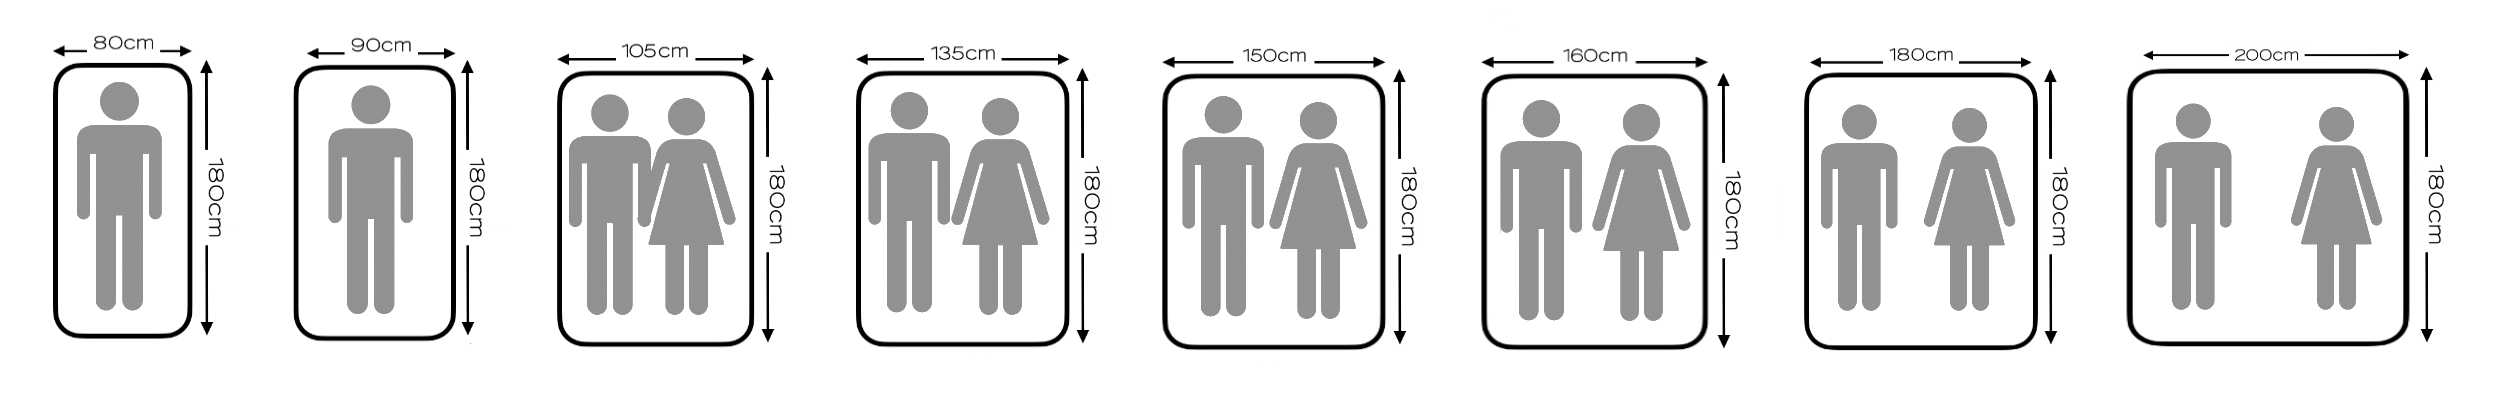 medidas dunlopillo_180cm